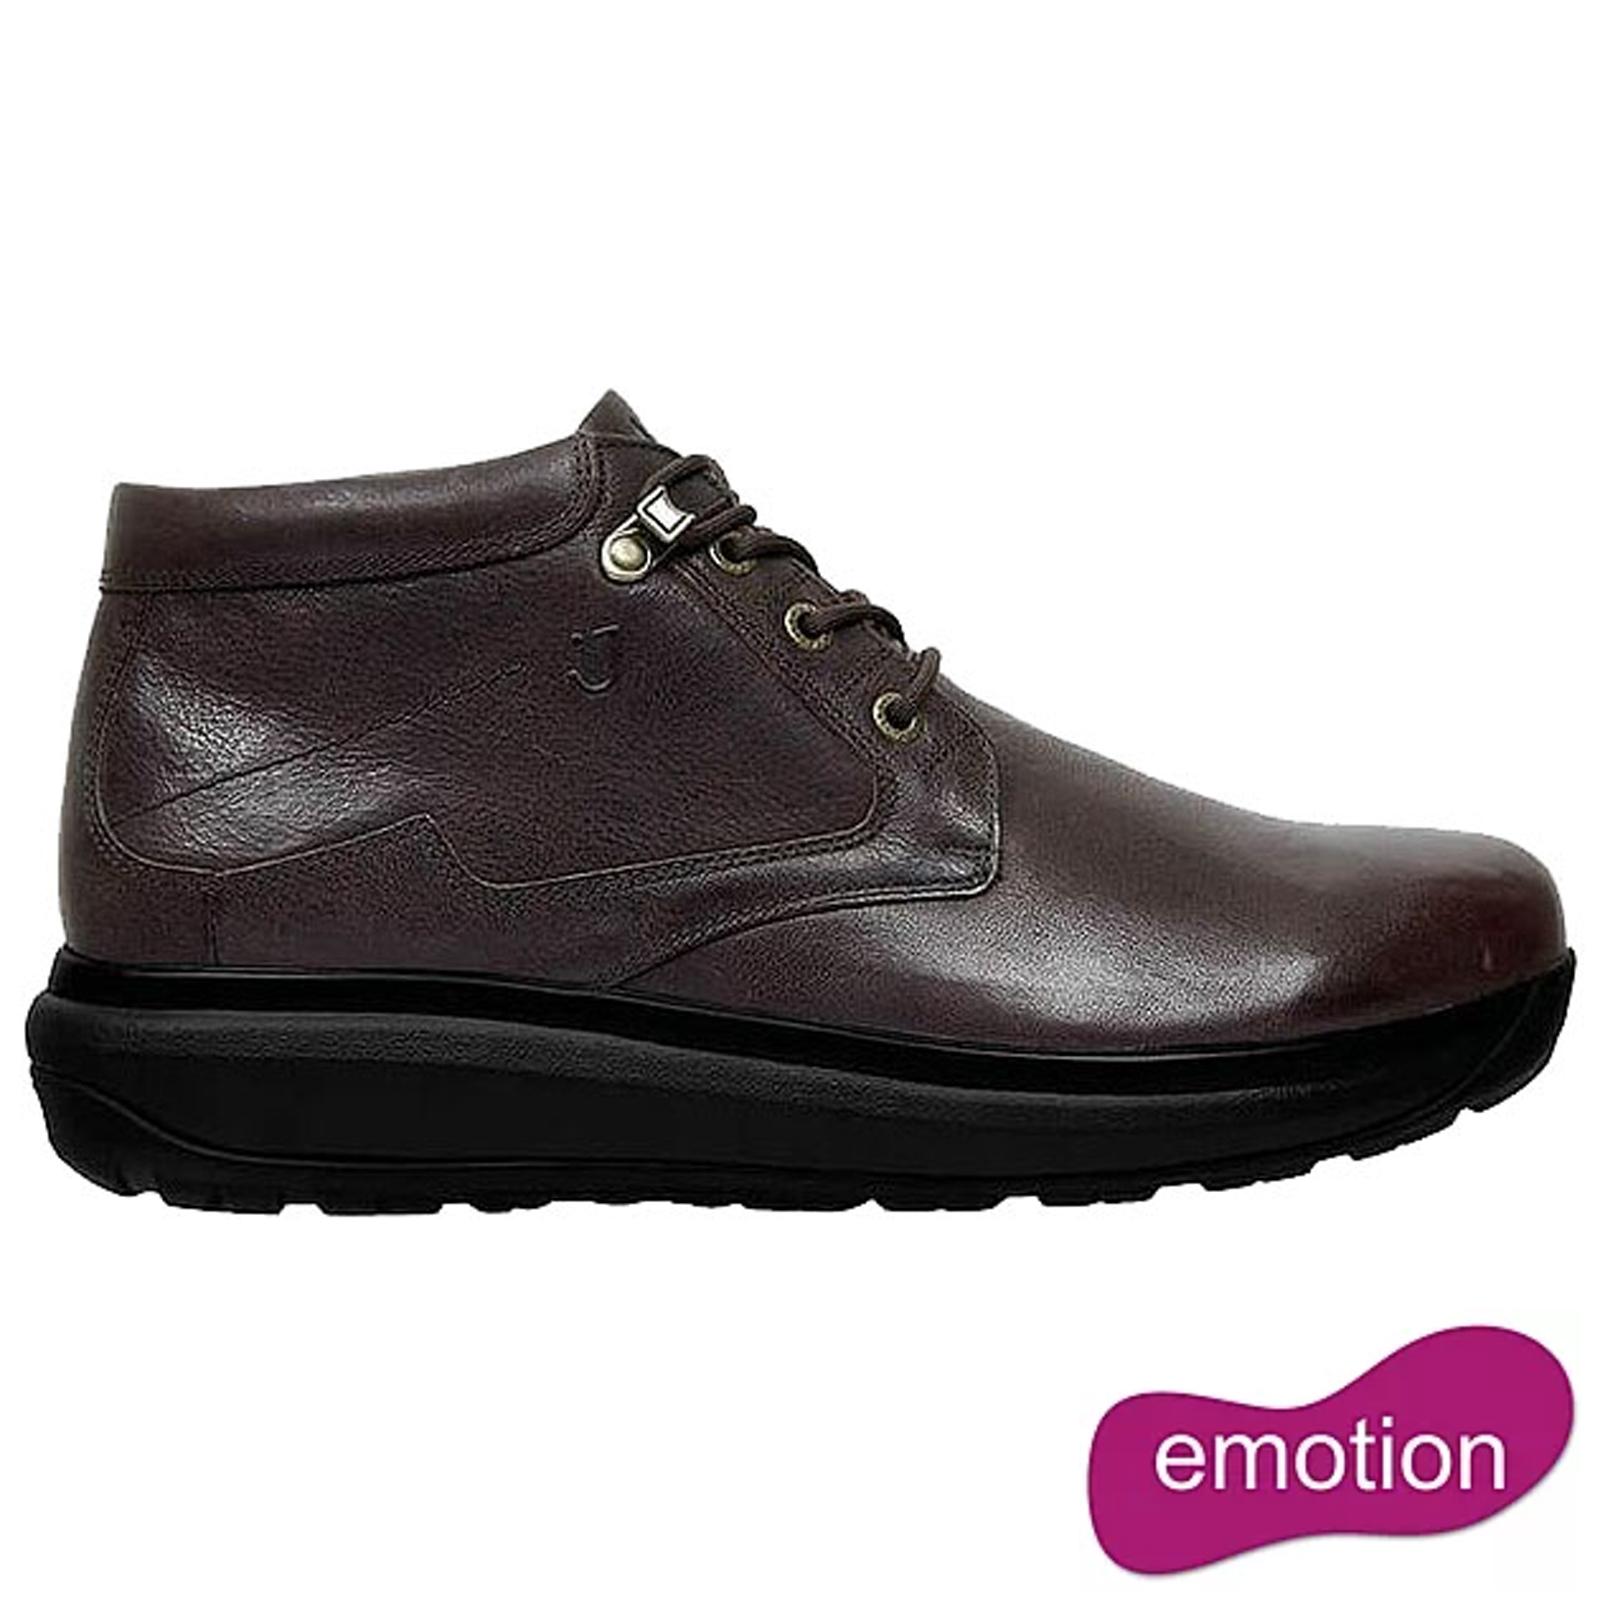 Joya Mens Liverpool Ankle Boots - Dark Brown